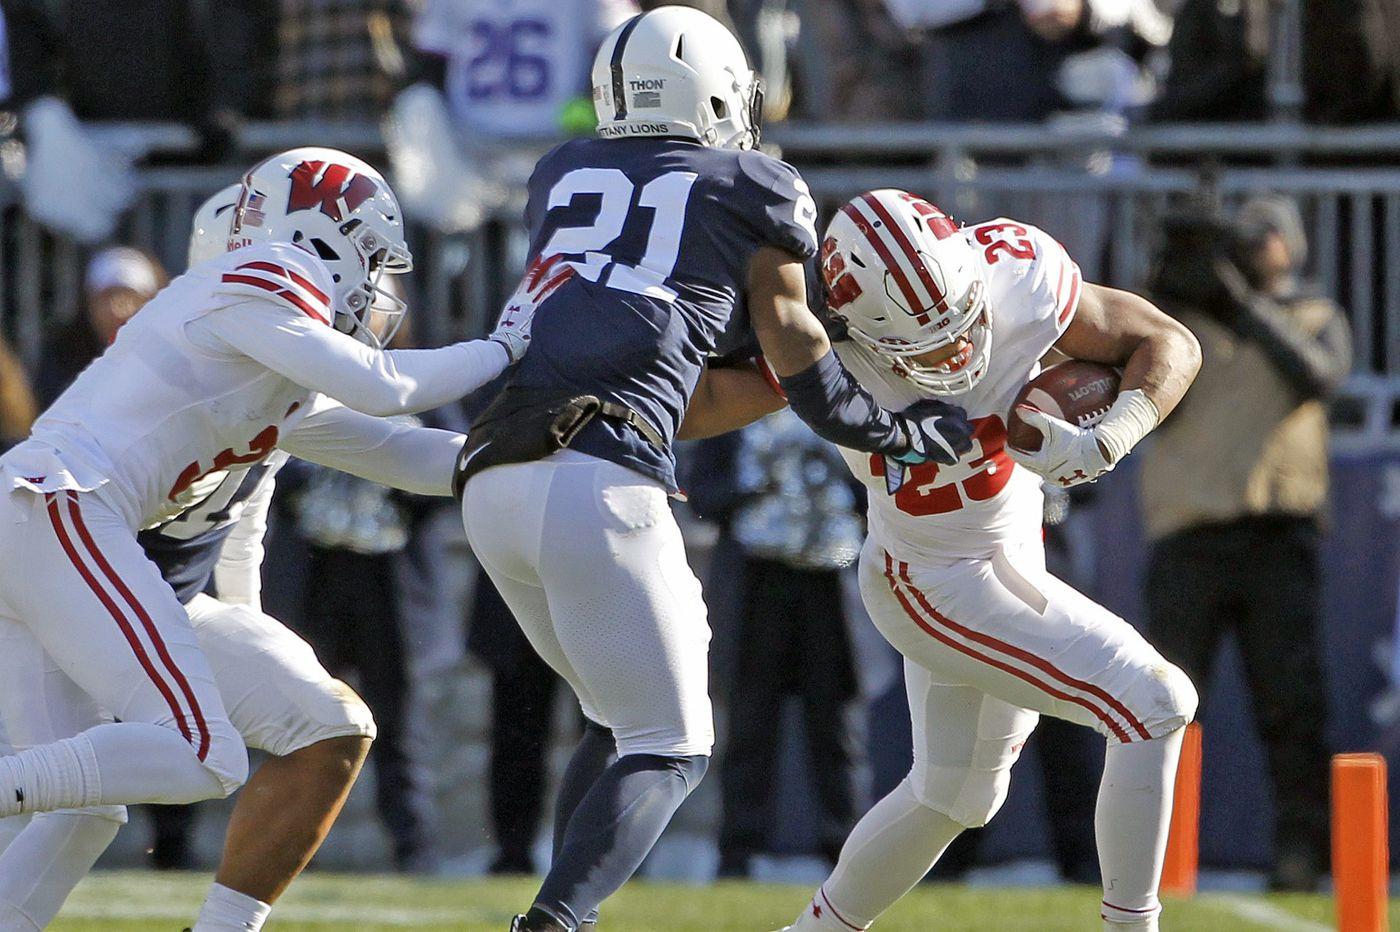 Penn State beats Wisconsin, despite Salem grad Jonathan Taylor's strong showing